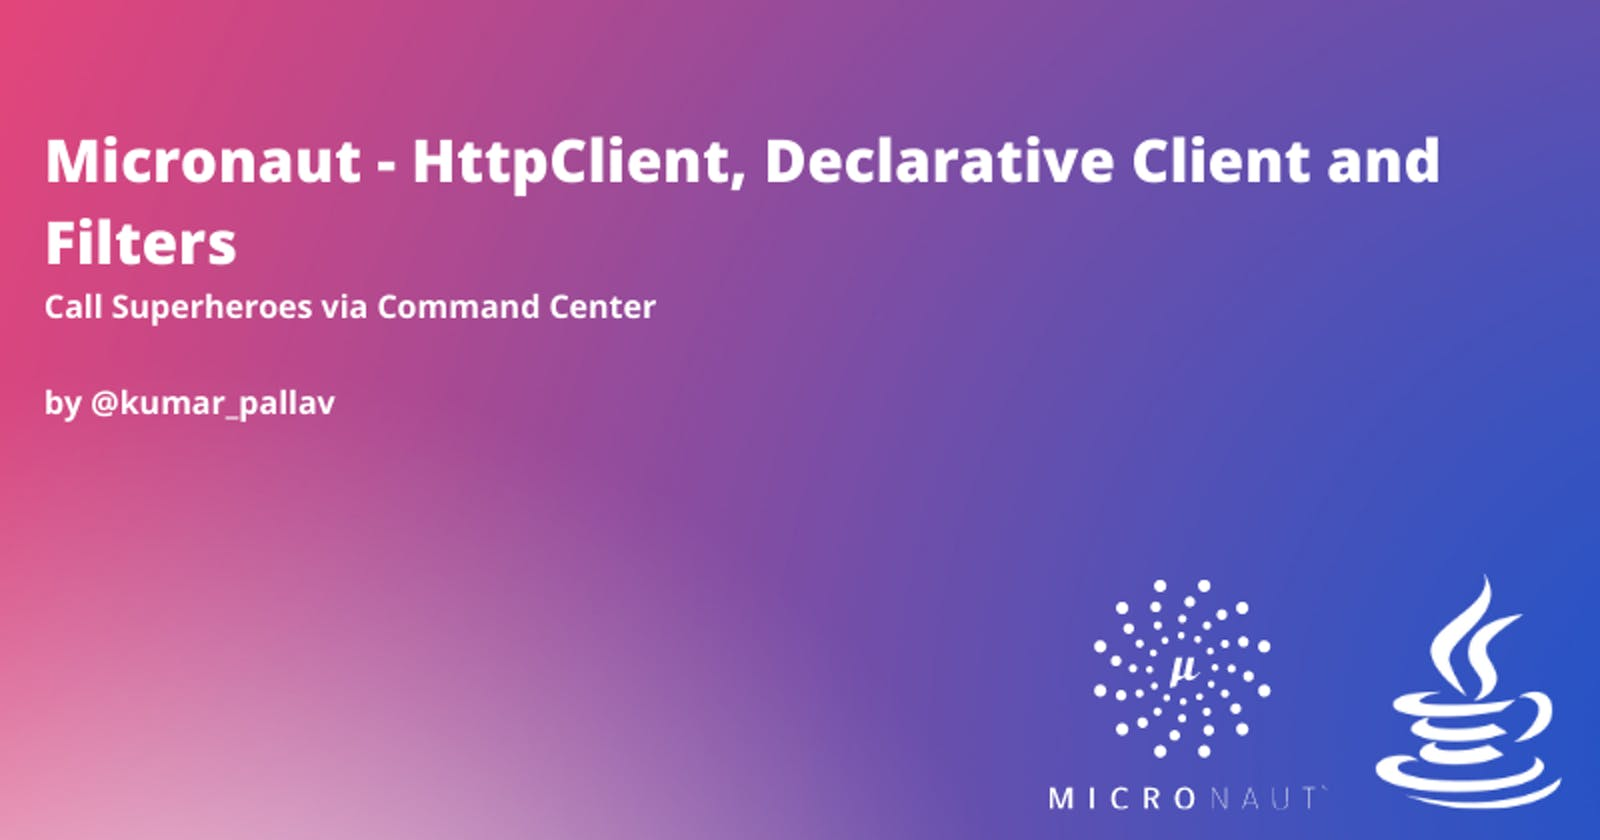 Micronaut - HttpClient, Declarative Client and Filters